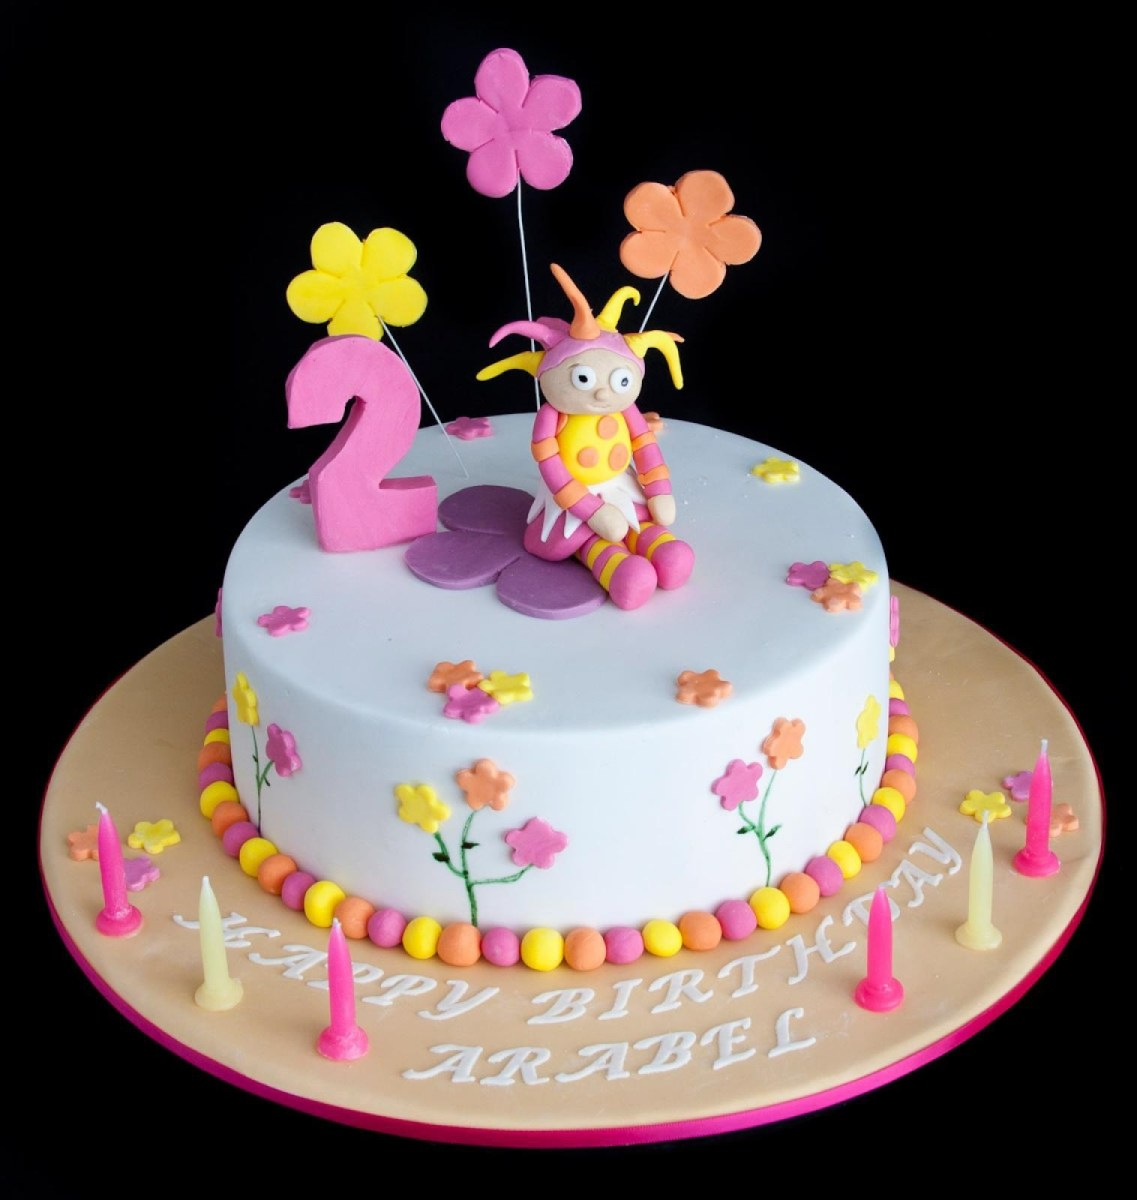 Birthday Cake Image Buy Toddler Birthday Cake For Boys Online At Best Prices From Guntur